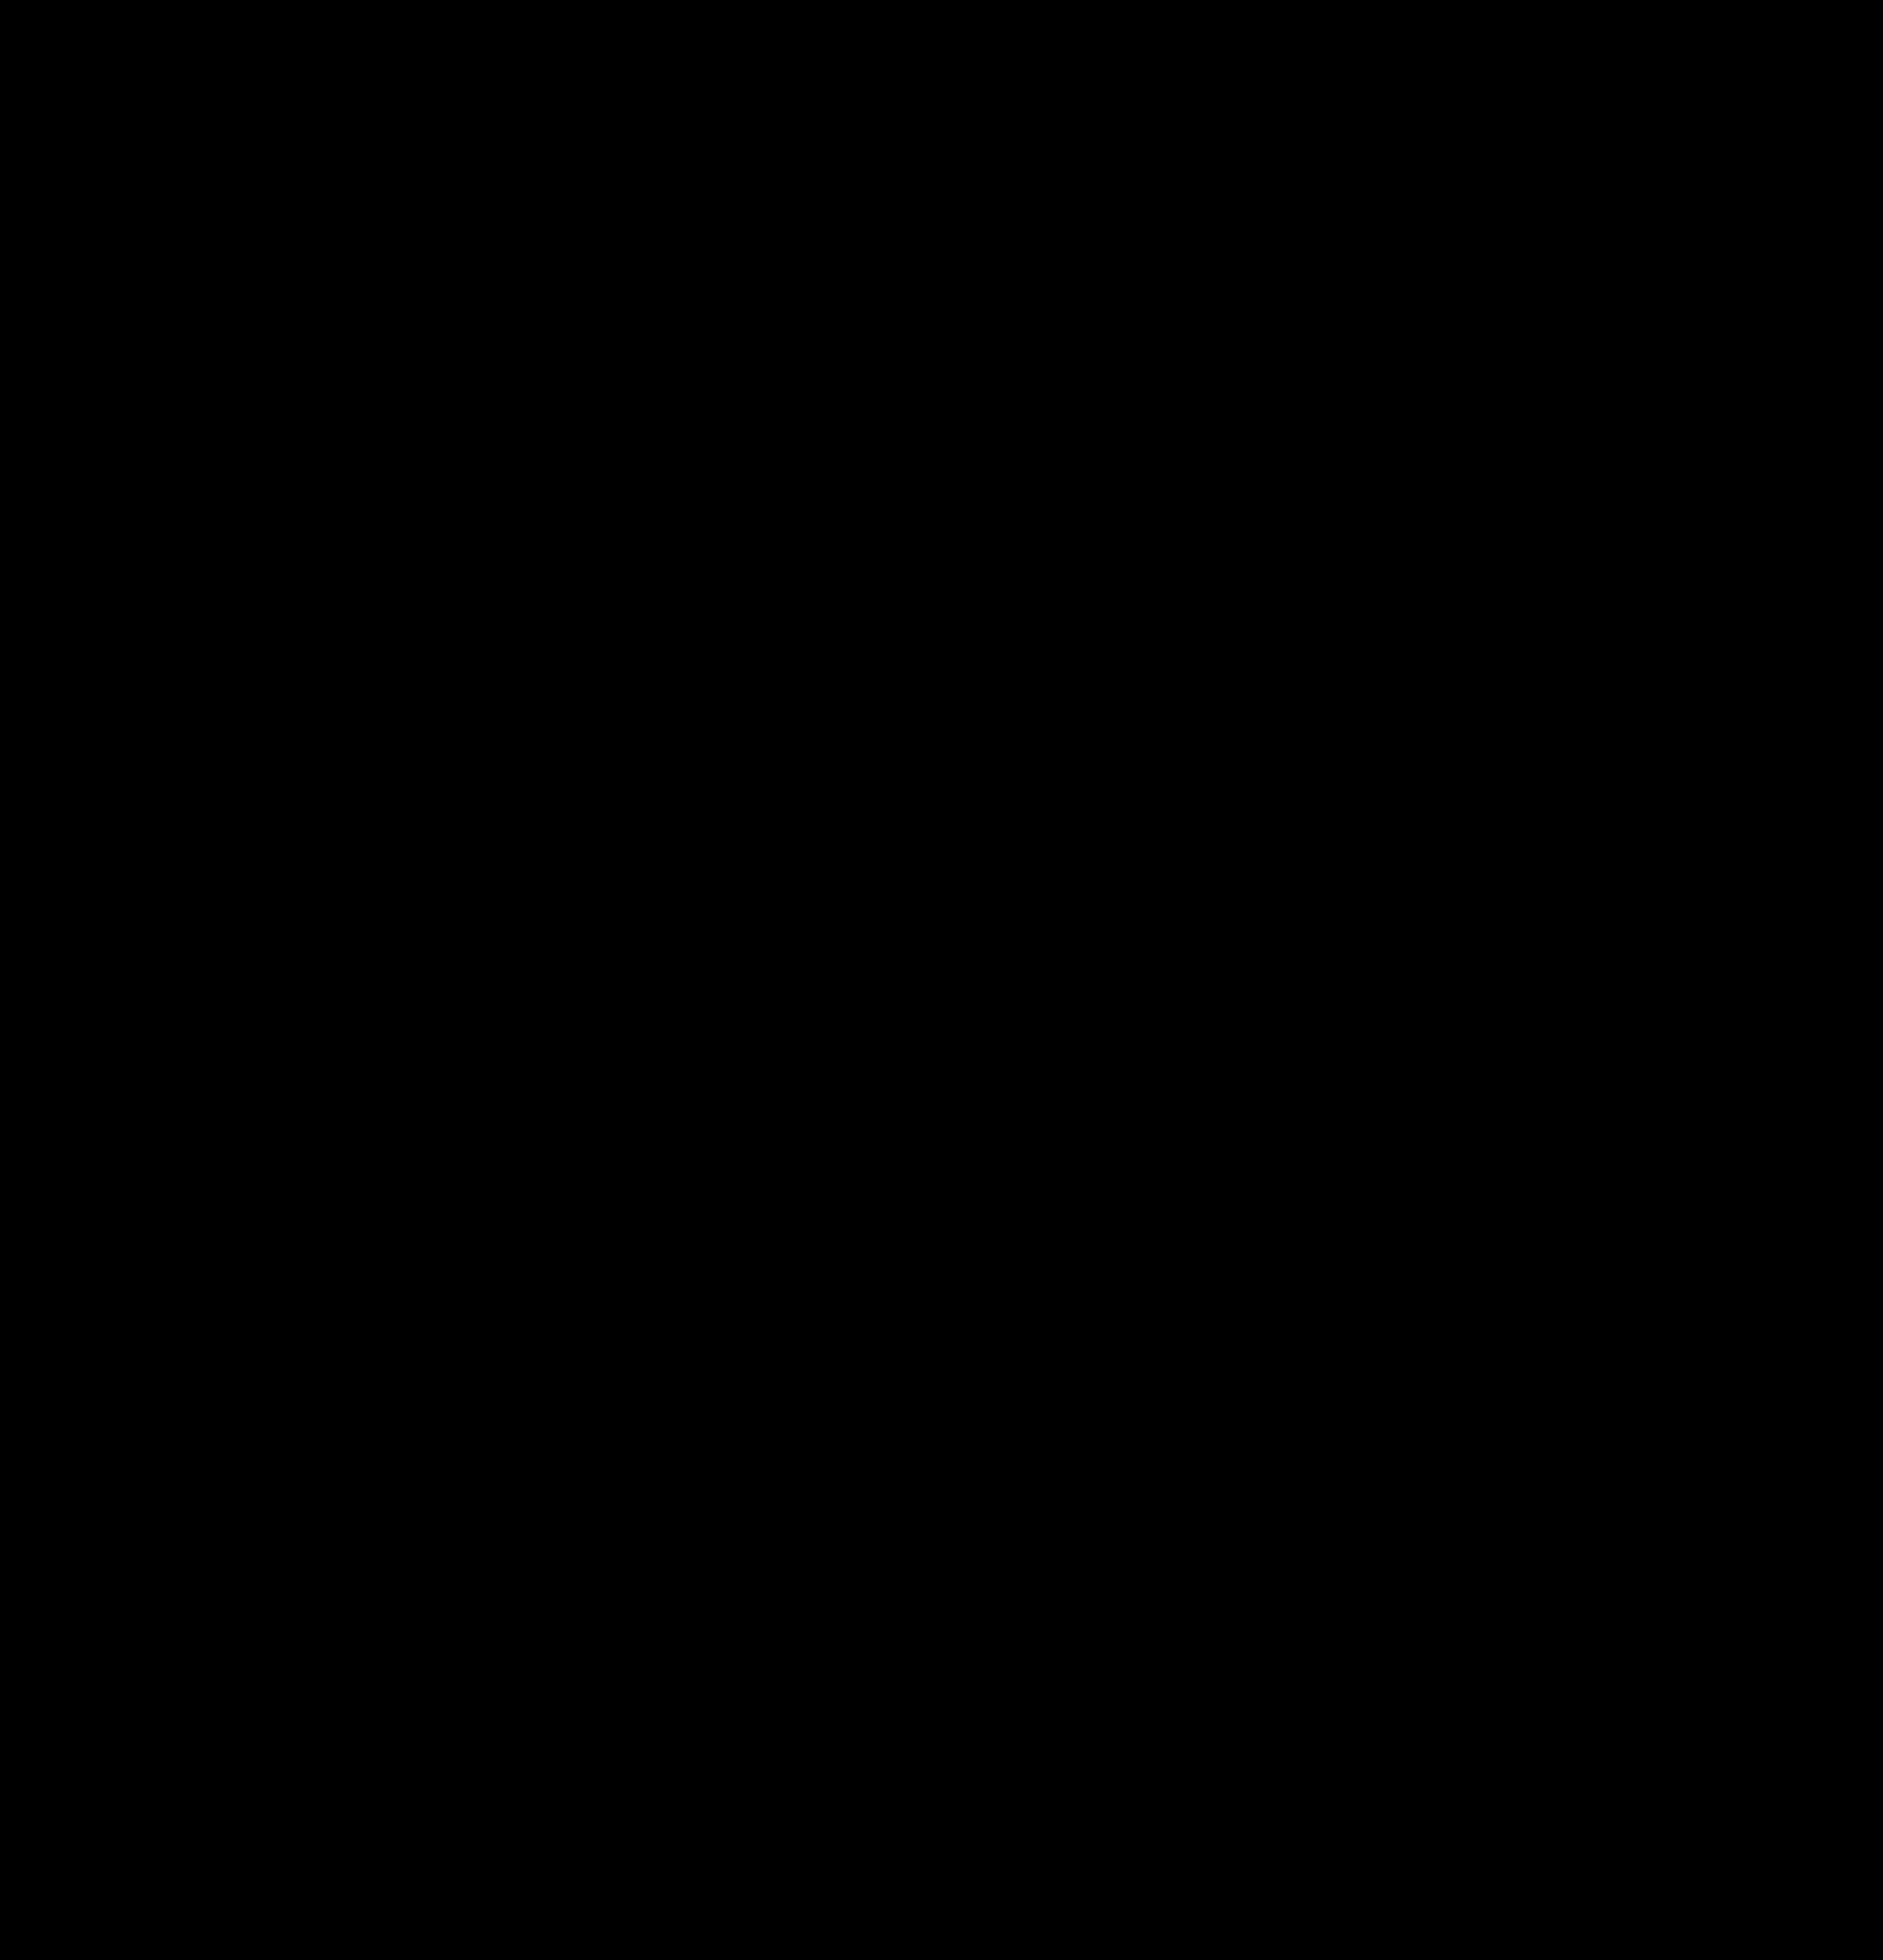 Caslon-540-billboard